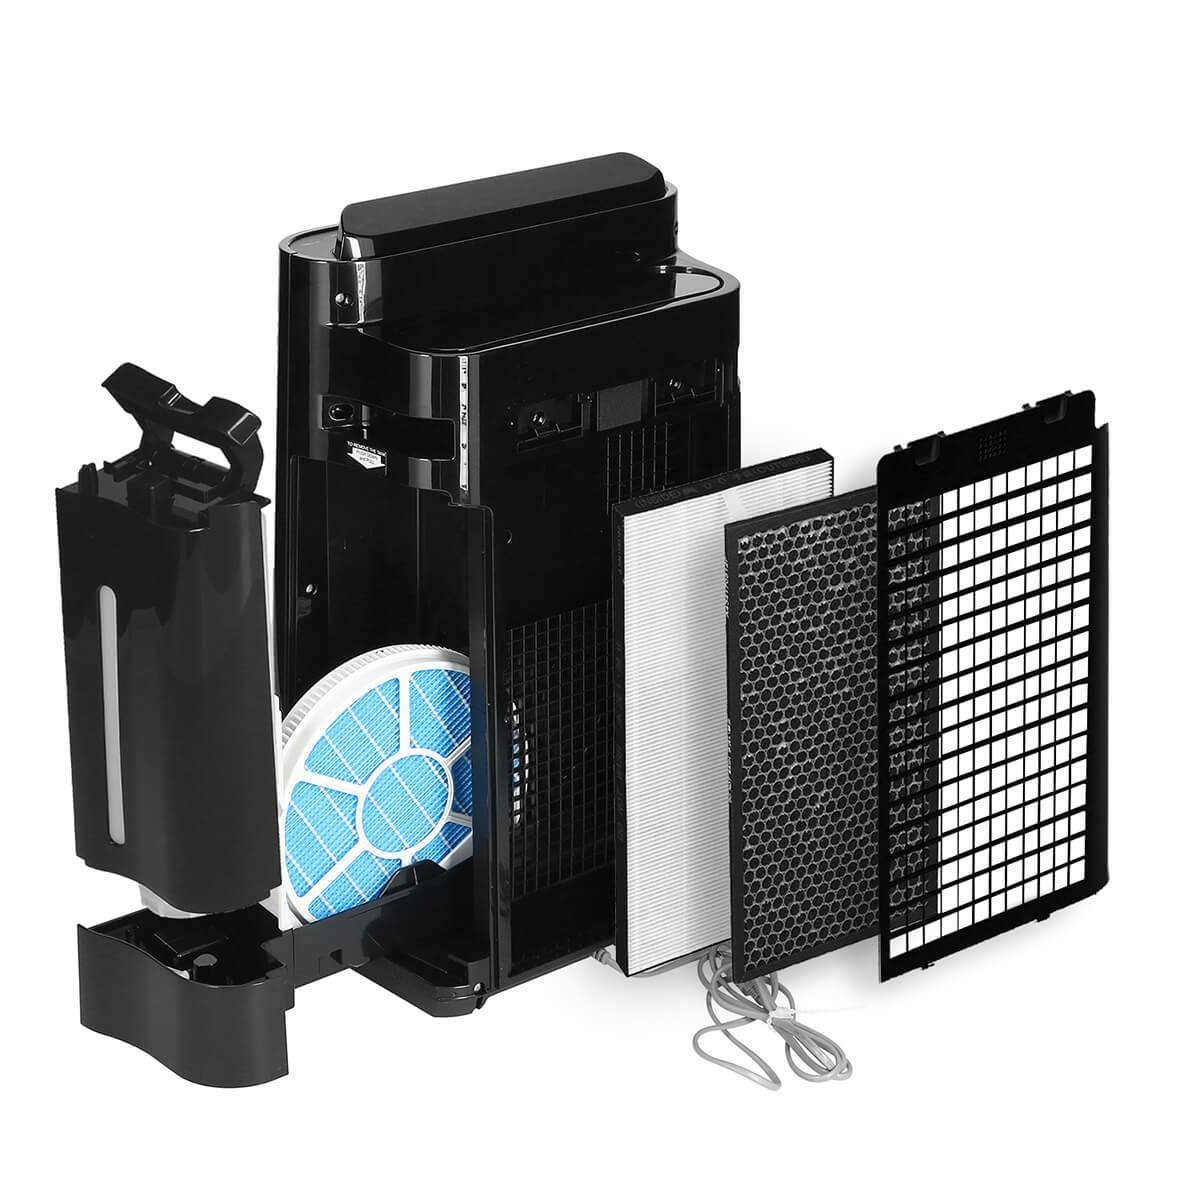 Sharp KC-D40EUB - prezentacja filtrów